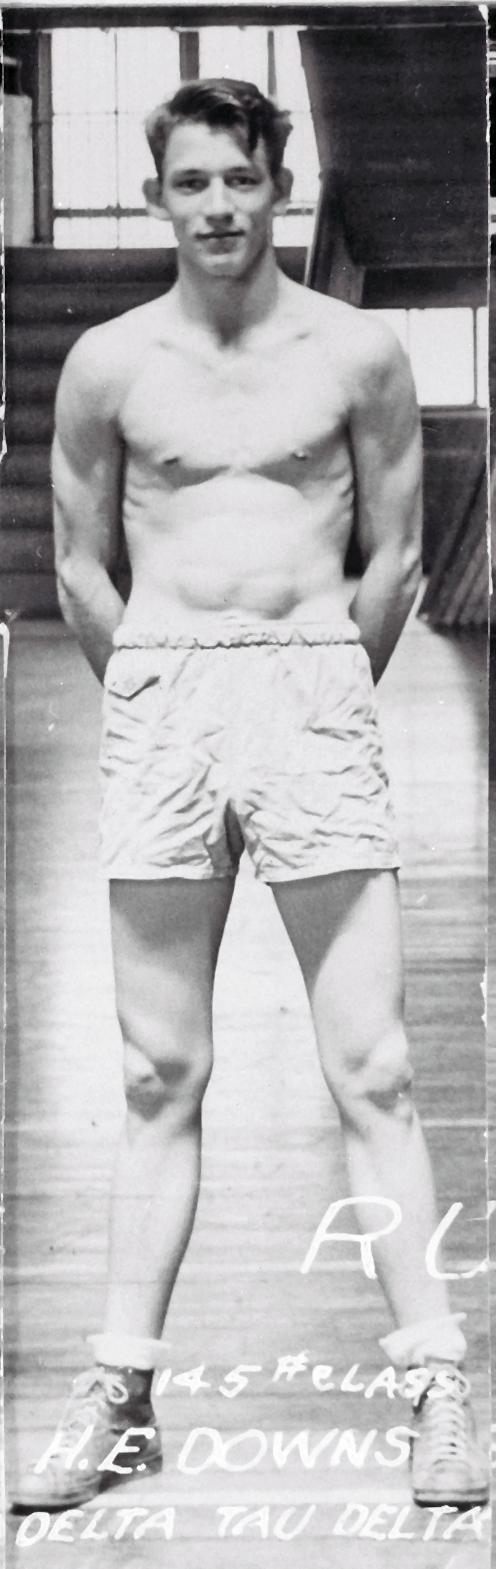 Boxing, Runner Up 145 lb. Class Delta Tau Delta H.E. Downs